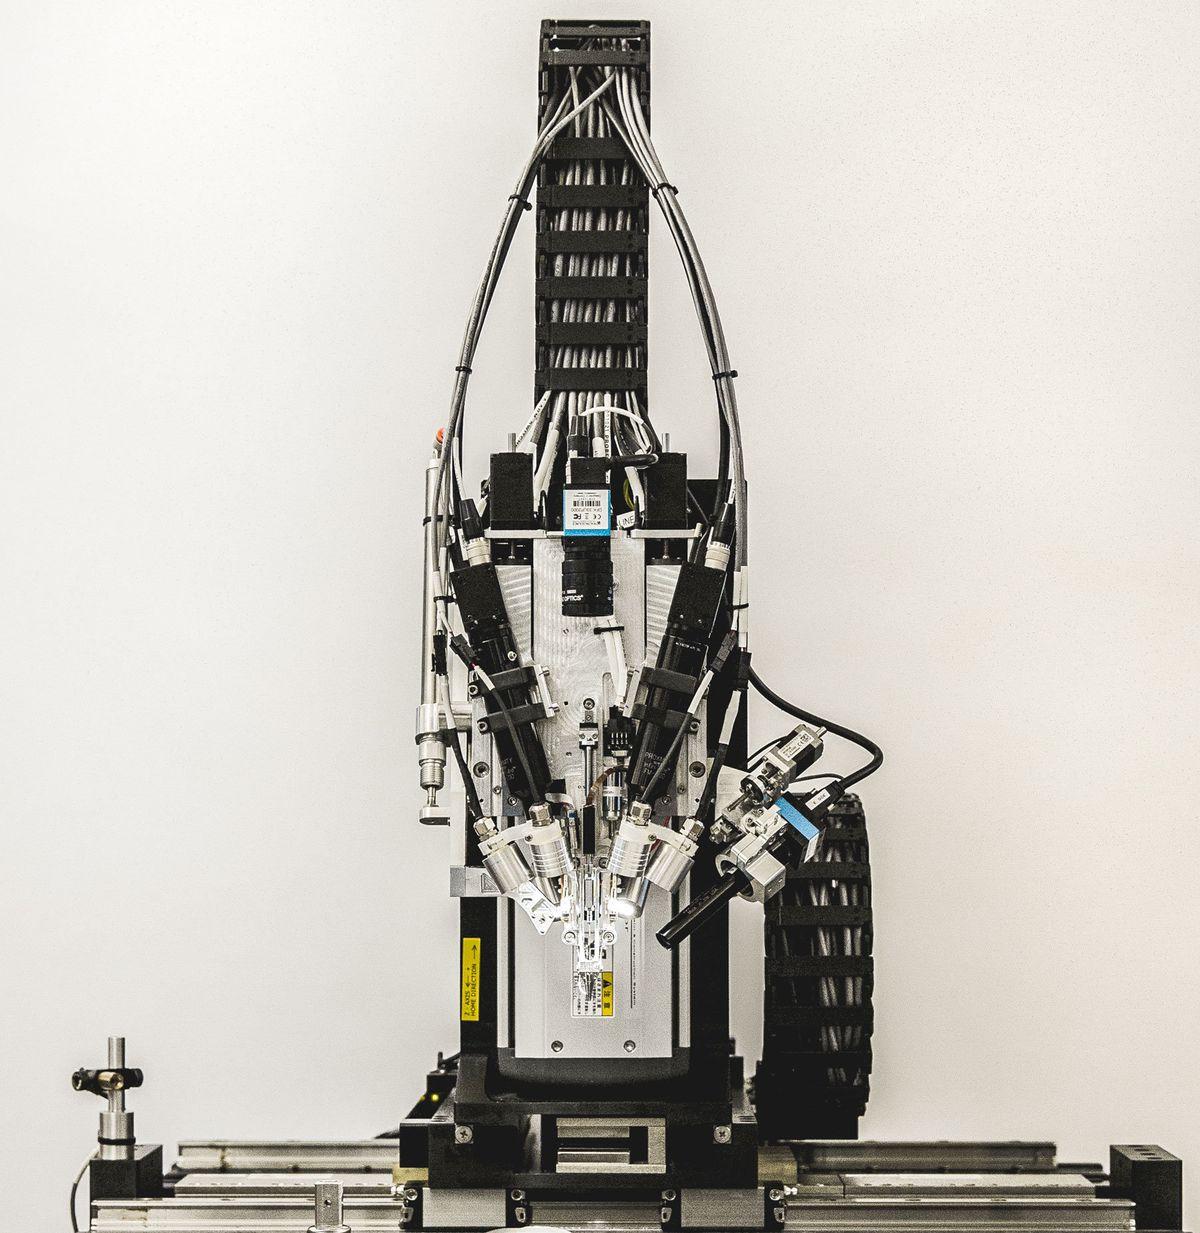 Neuralink's machine for inserting the threads.